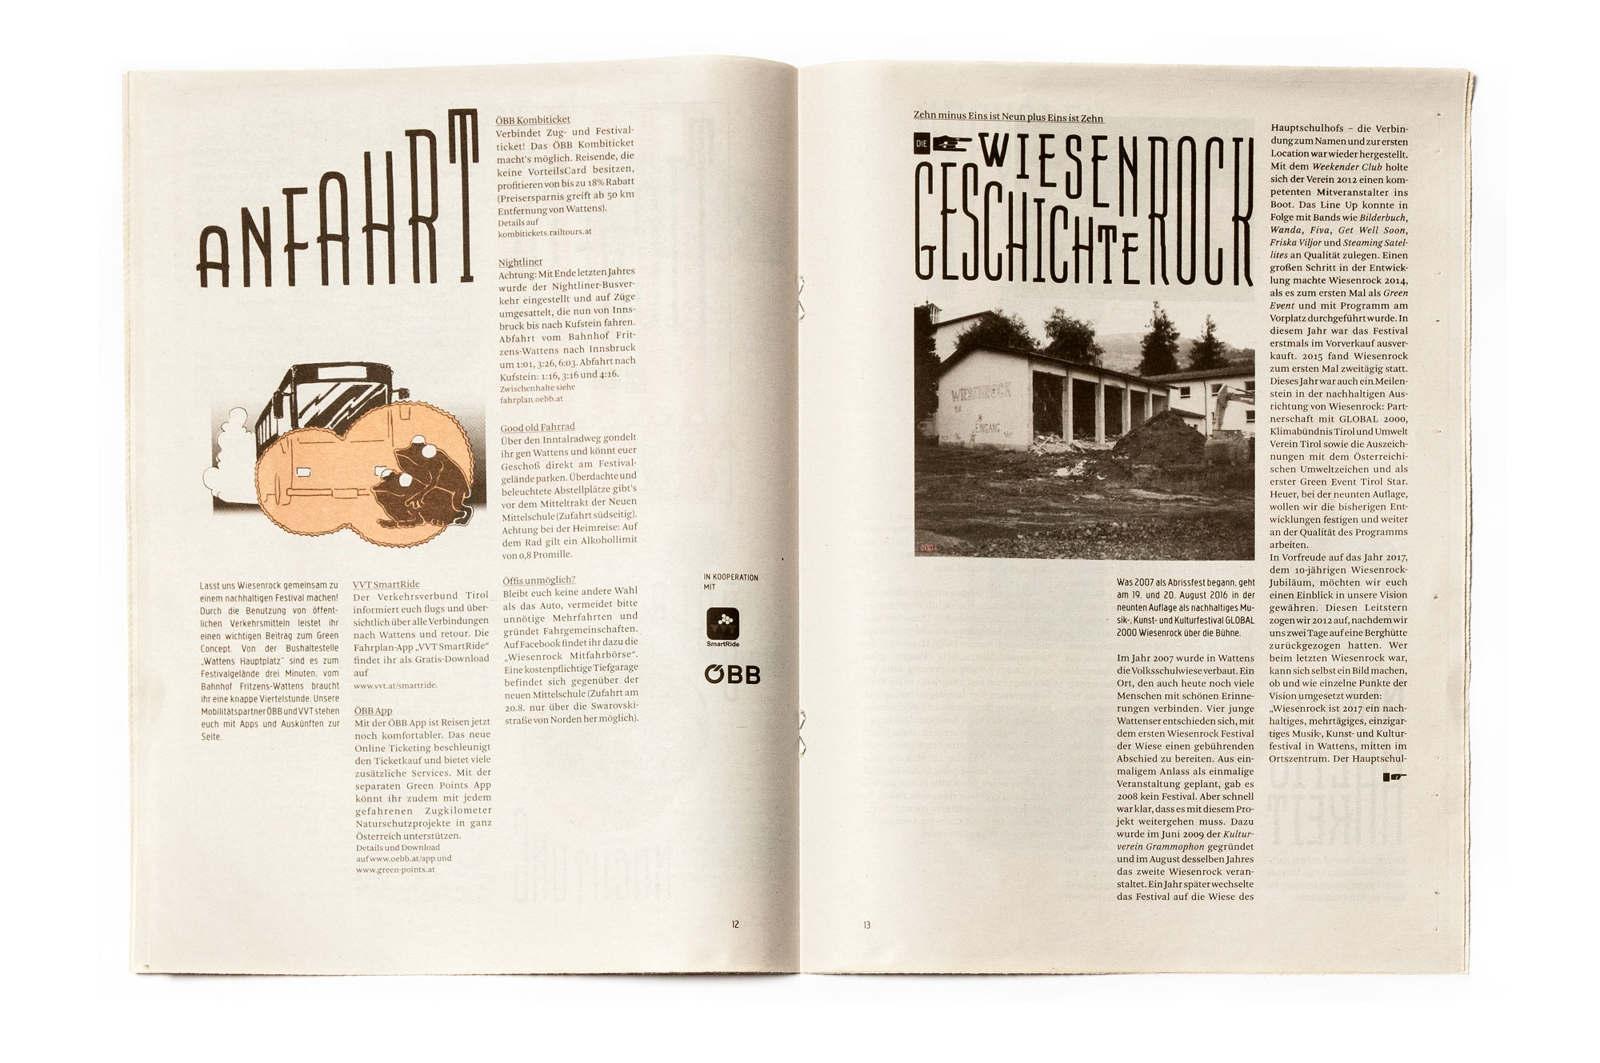 Wiesenrock Newspaper - Patrick Bonato